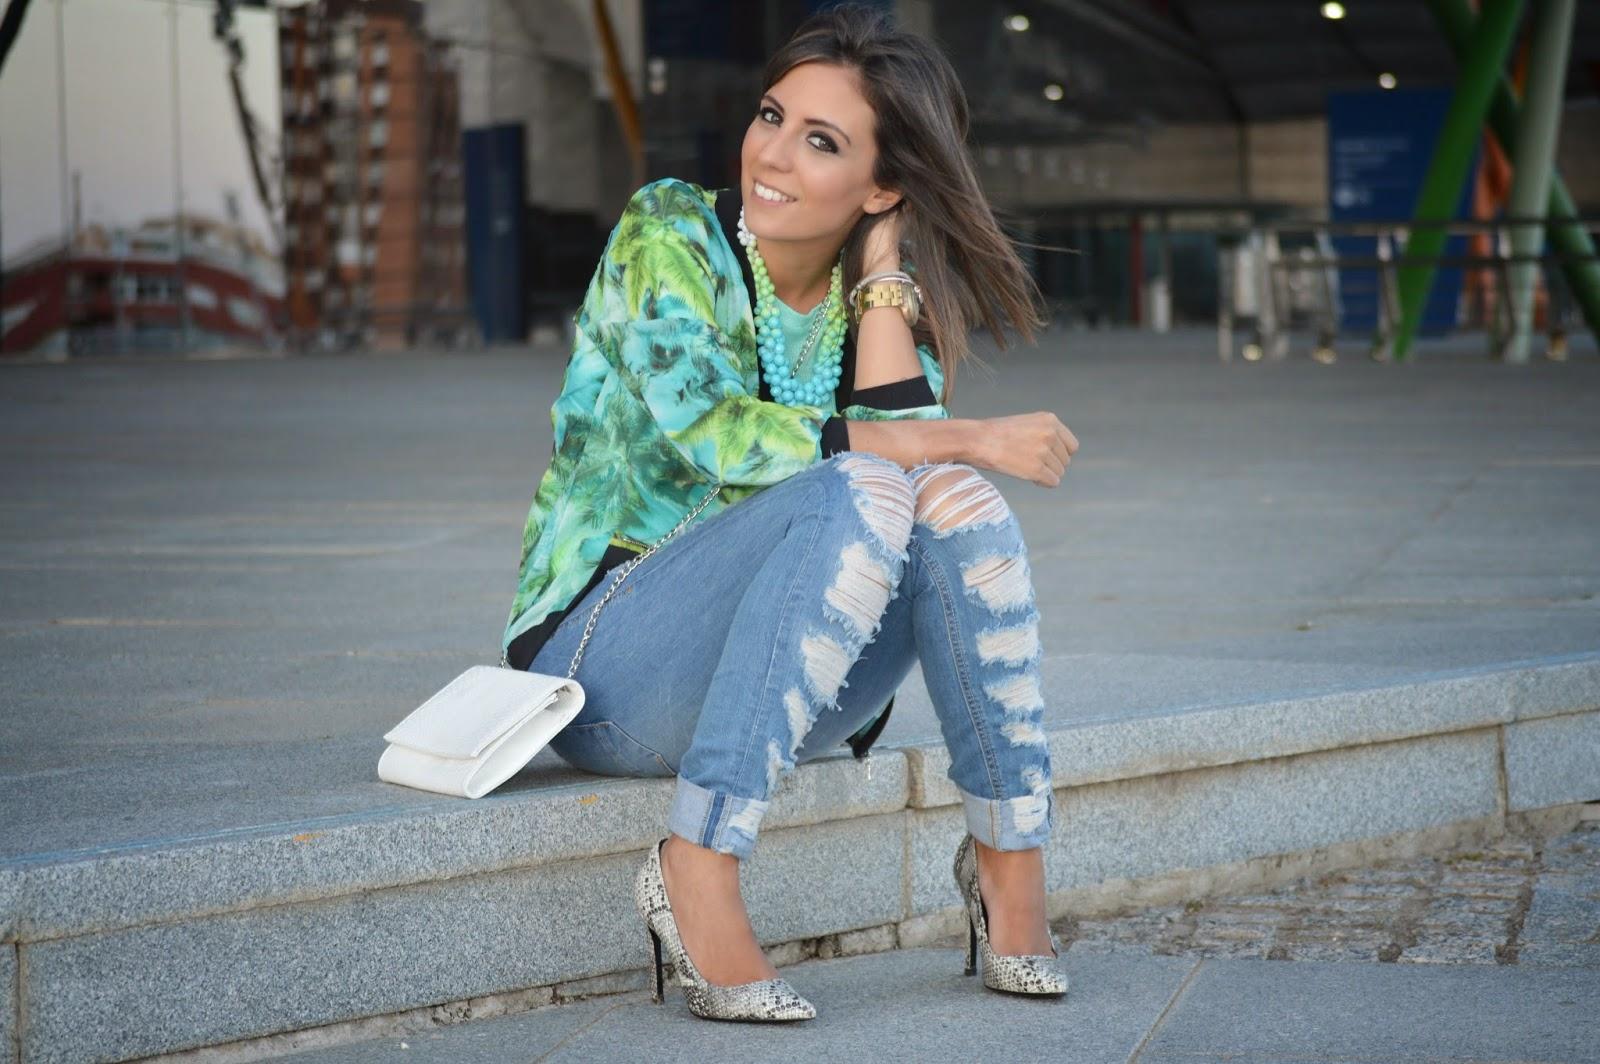 street style style ootd cristina style blogger malagueña fashion blogger malagueña chic casual bomber outfit look stradivarius lefites mango parfois gorgeous lovely moda mood